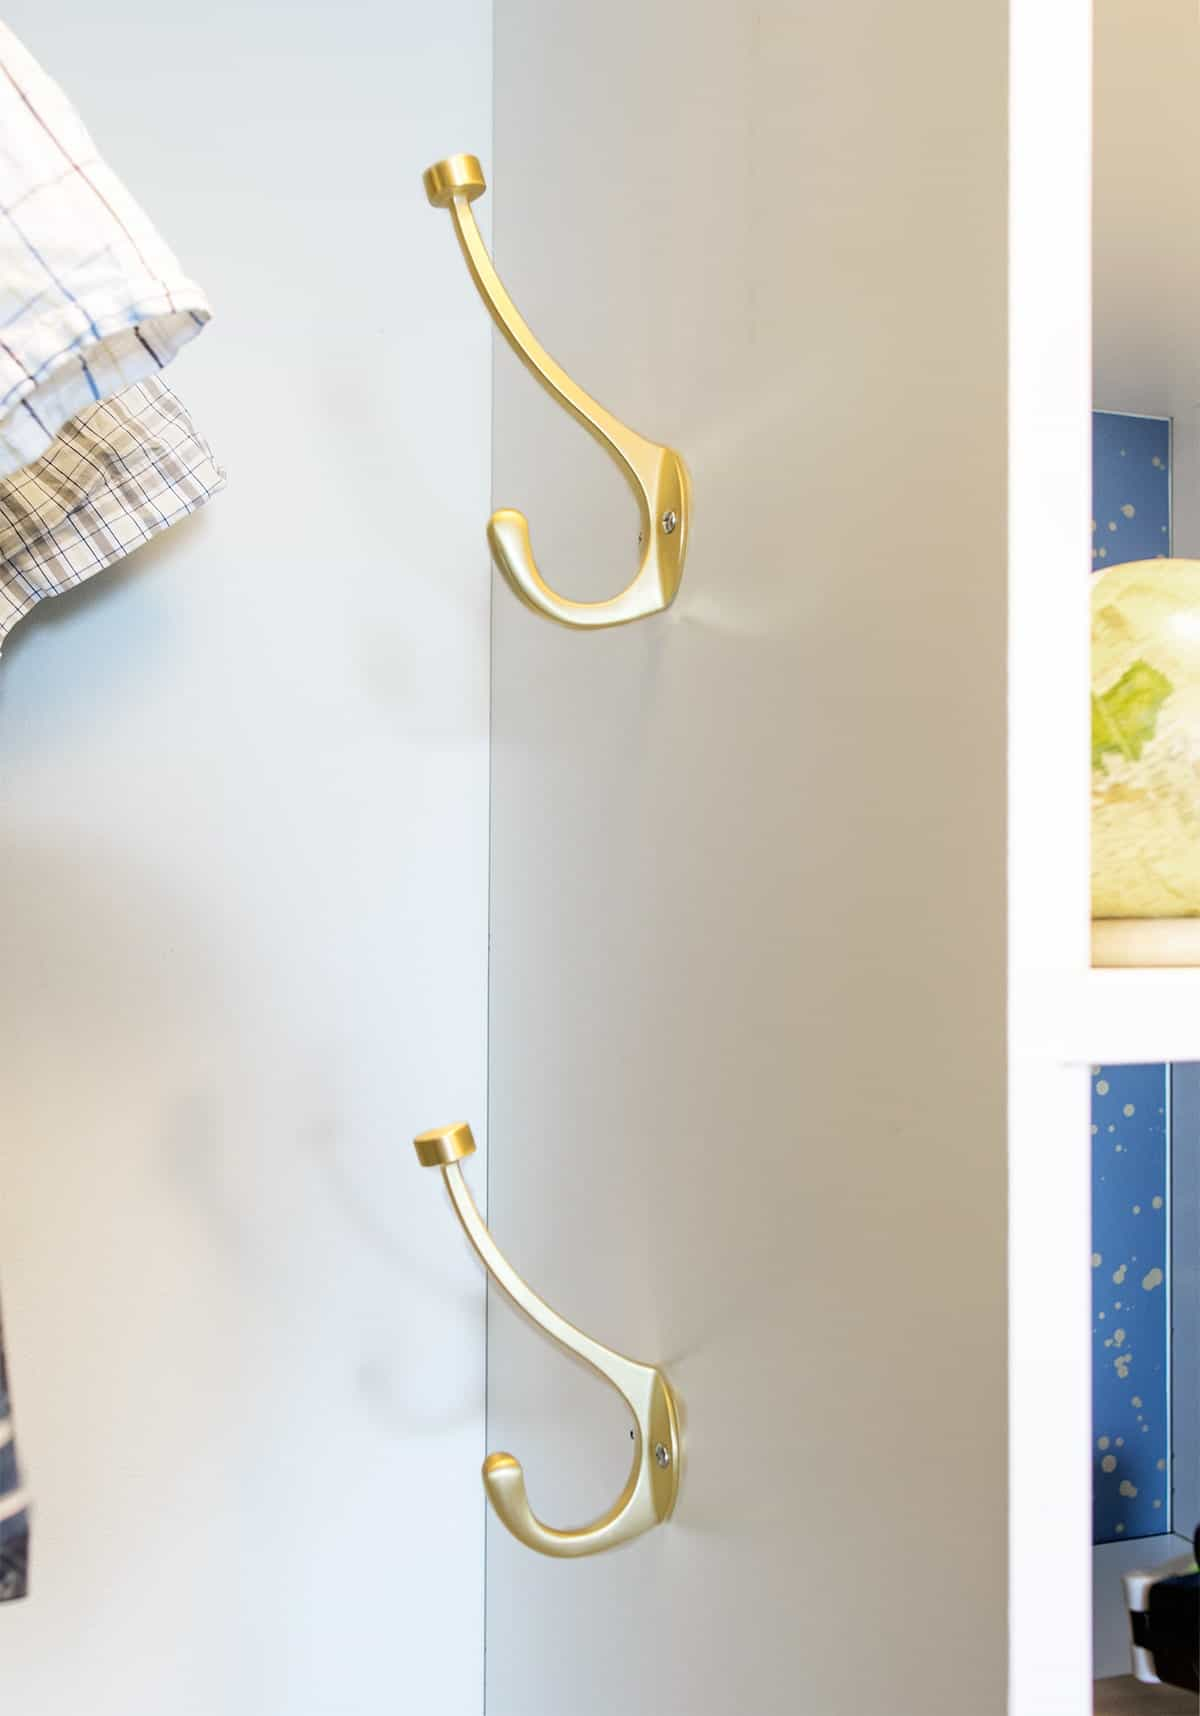 Hanging hooks in closet